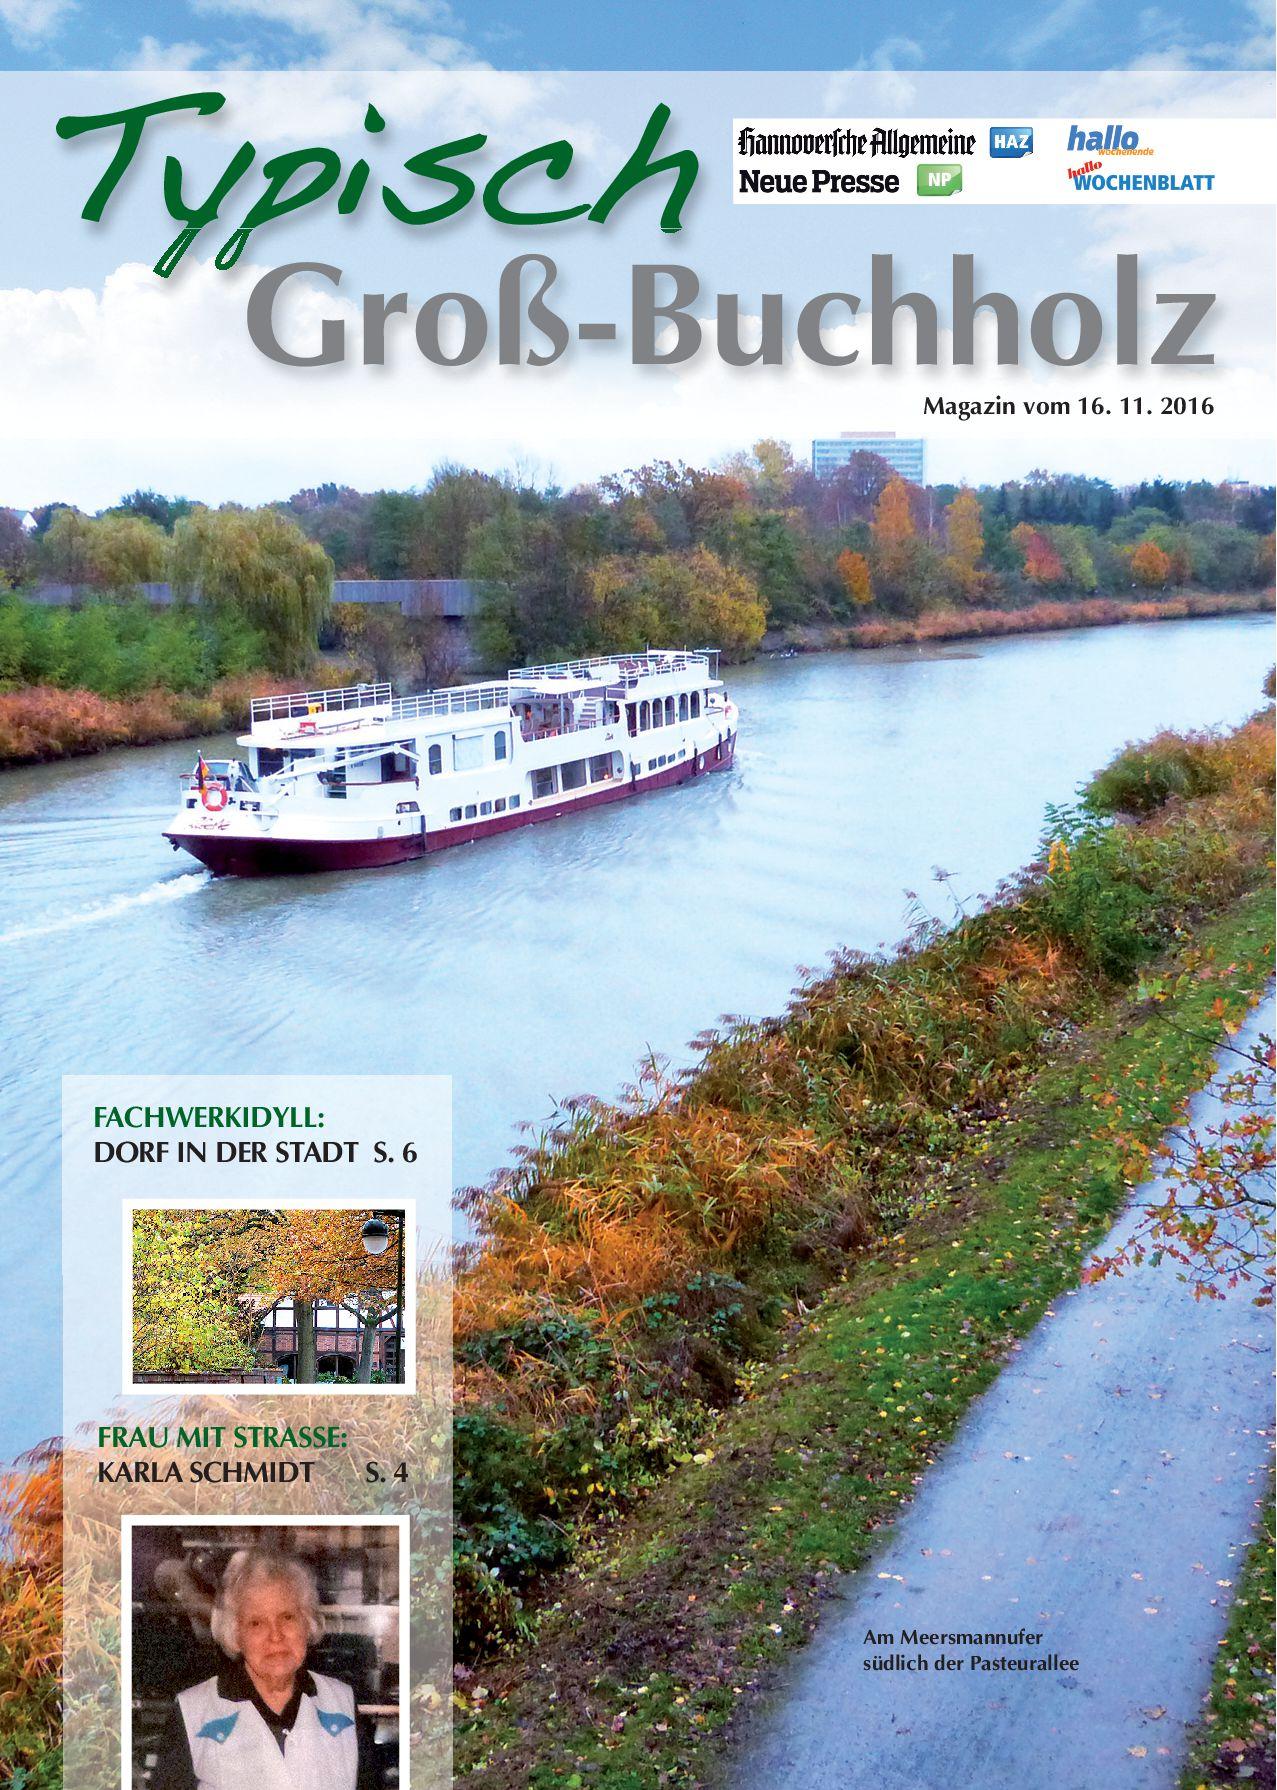 gross-buchholz-nr-1-vom-16-11-2016